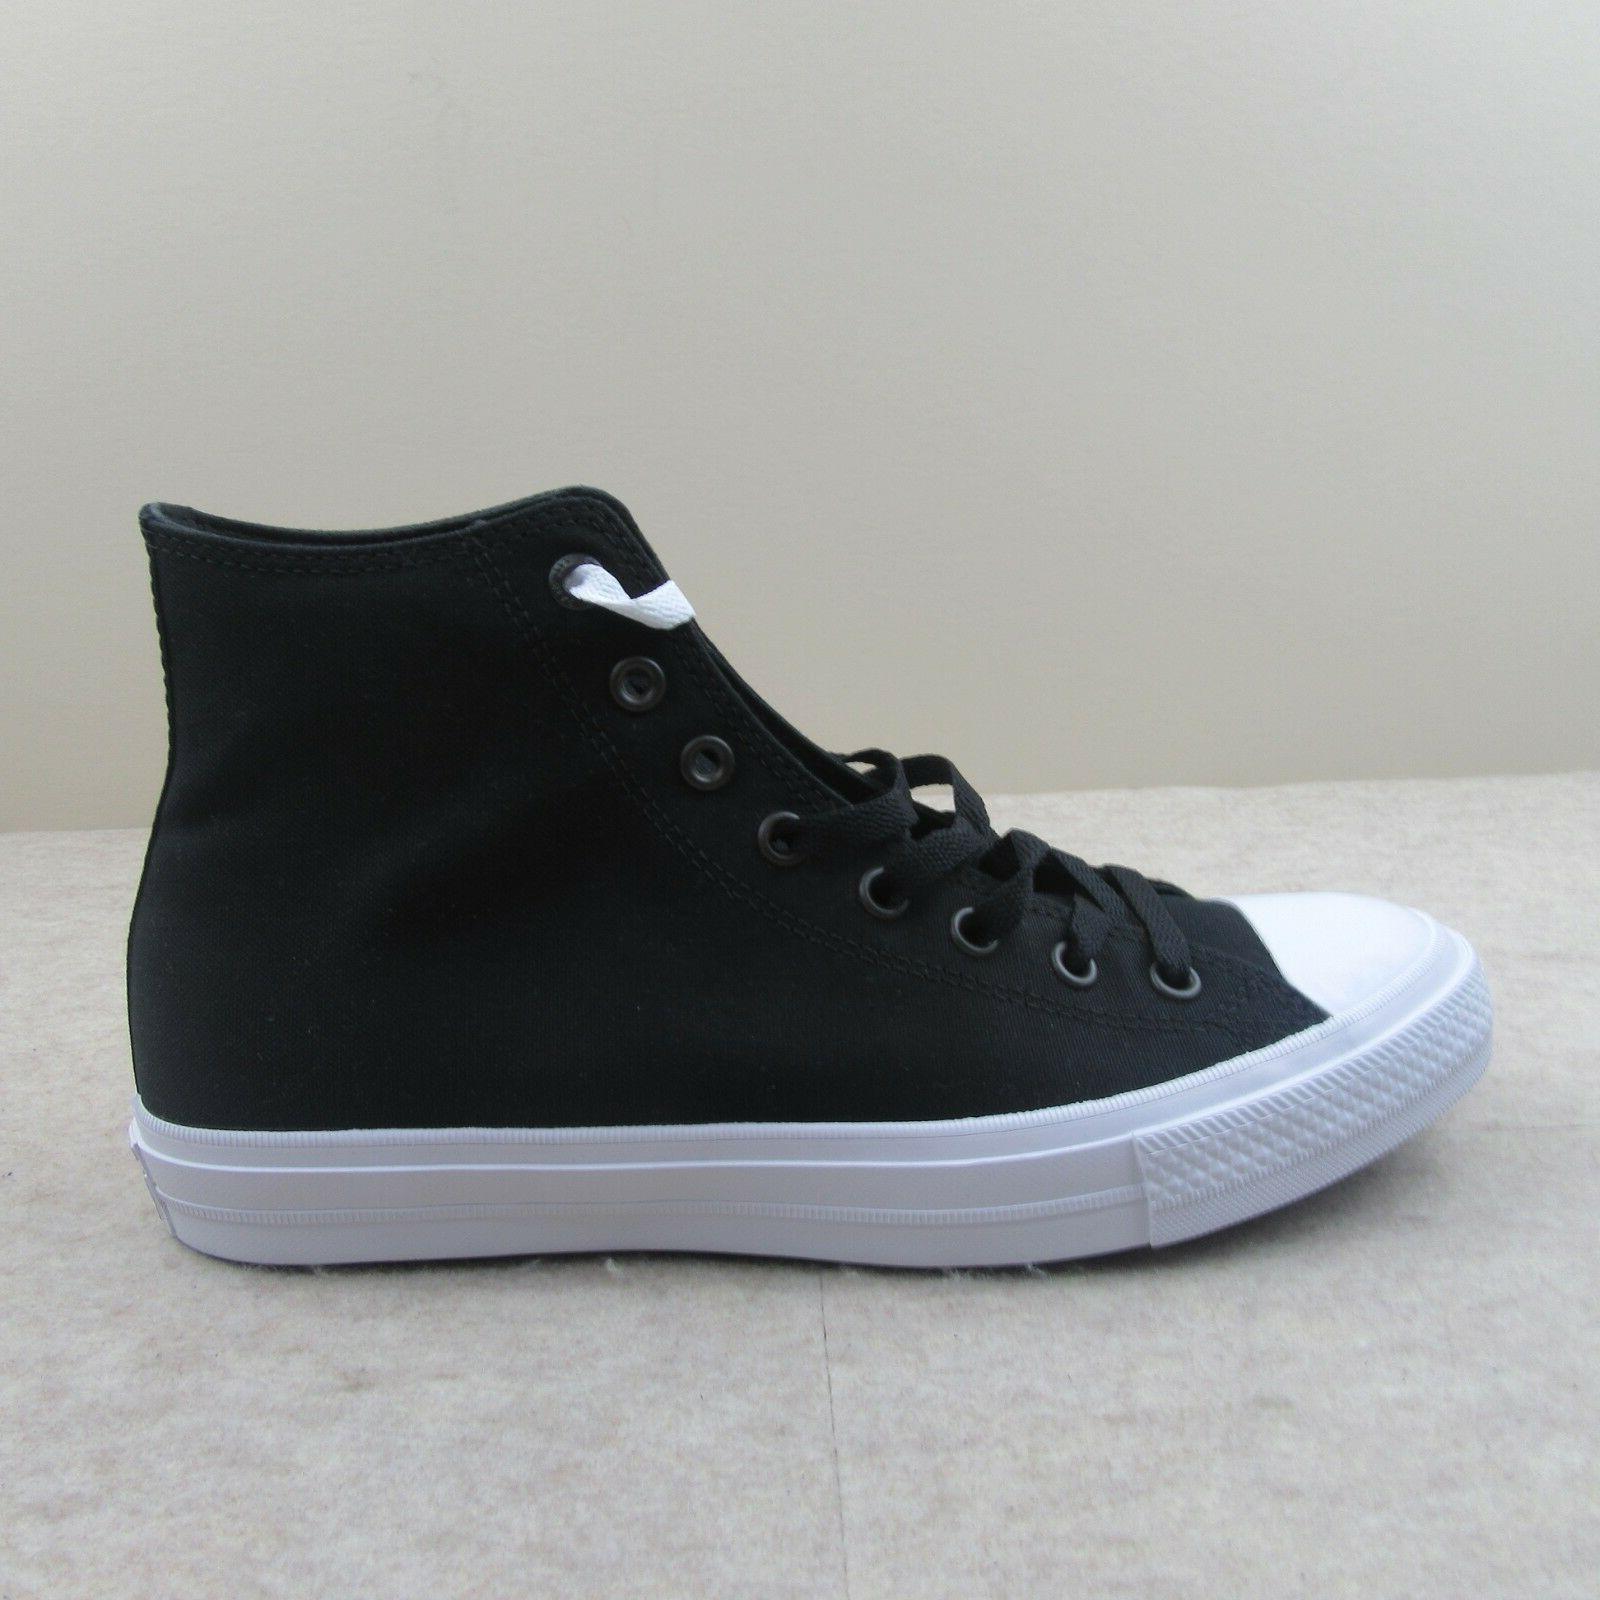 Converse Star II Lunarlon Black 150143C Size